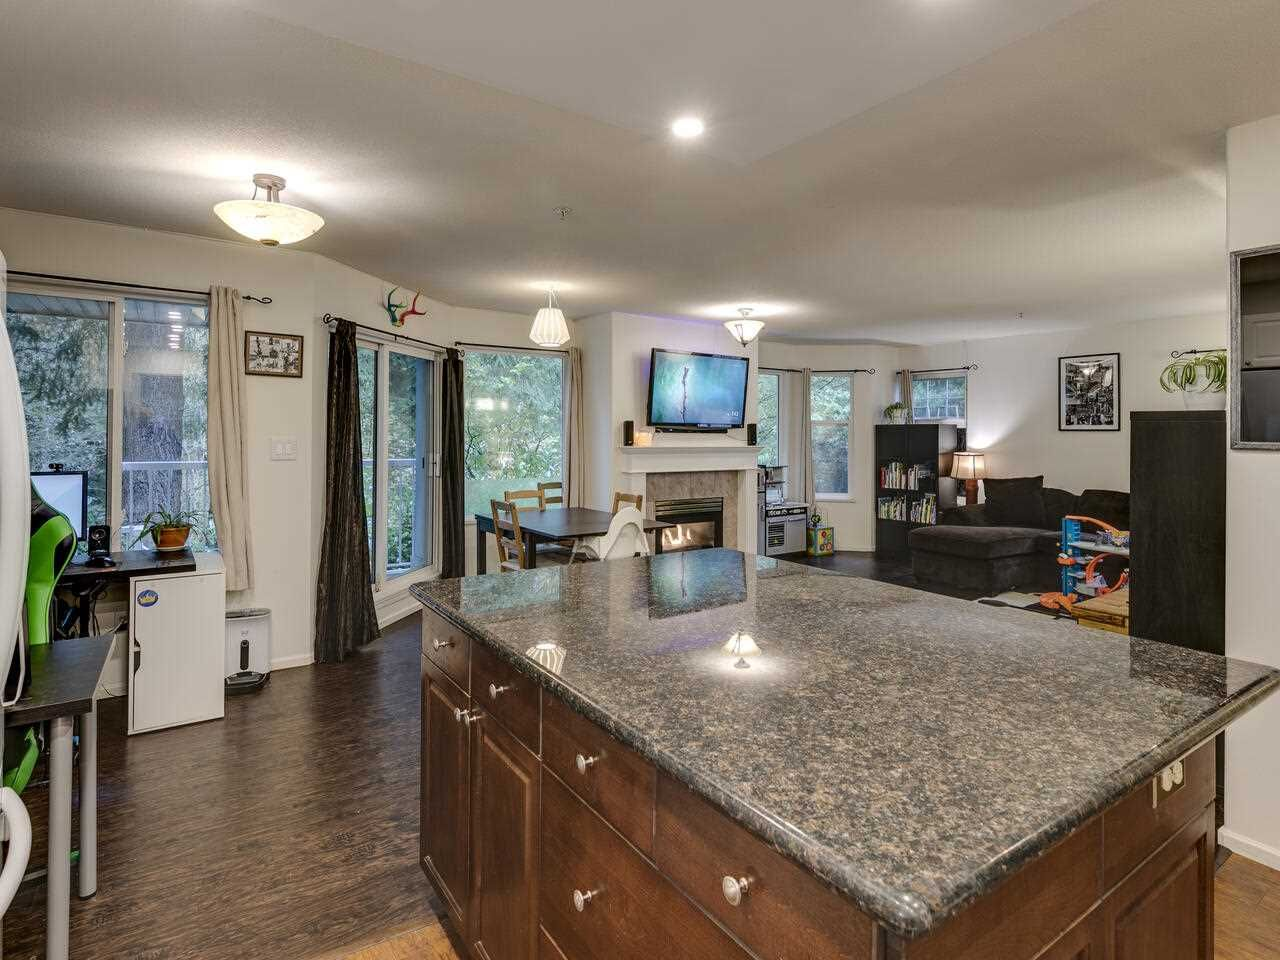 "Photo 15: Photos: 39 9036 208 Street in Langley: Walnut Grove Townhouse for sale in ""Hunter's Glen"" : MLS®# R2513931"